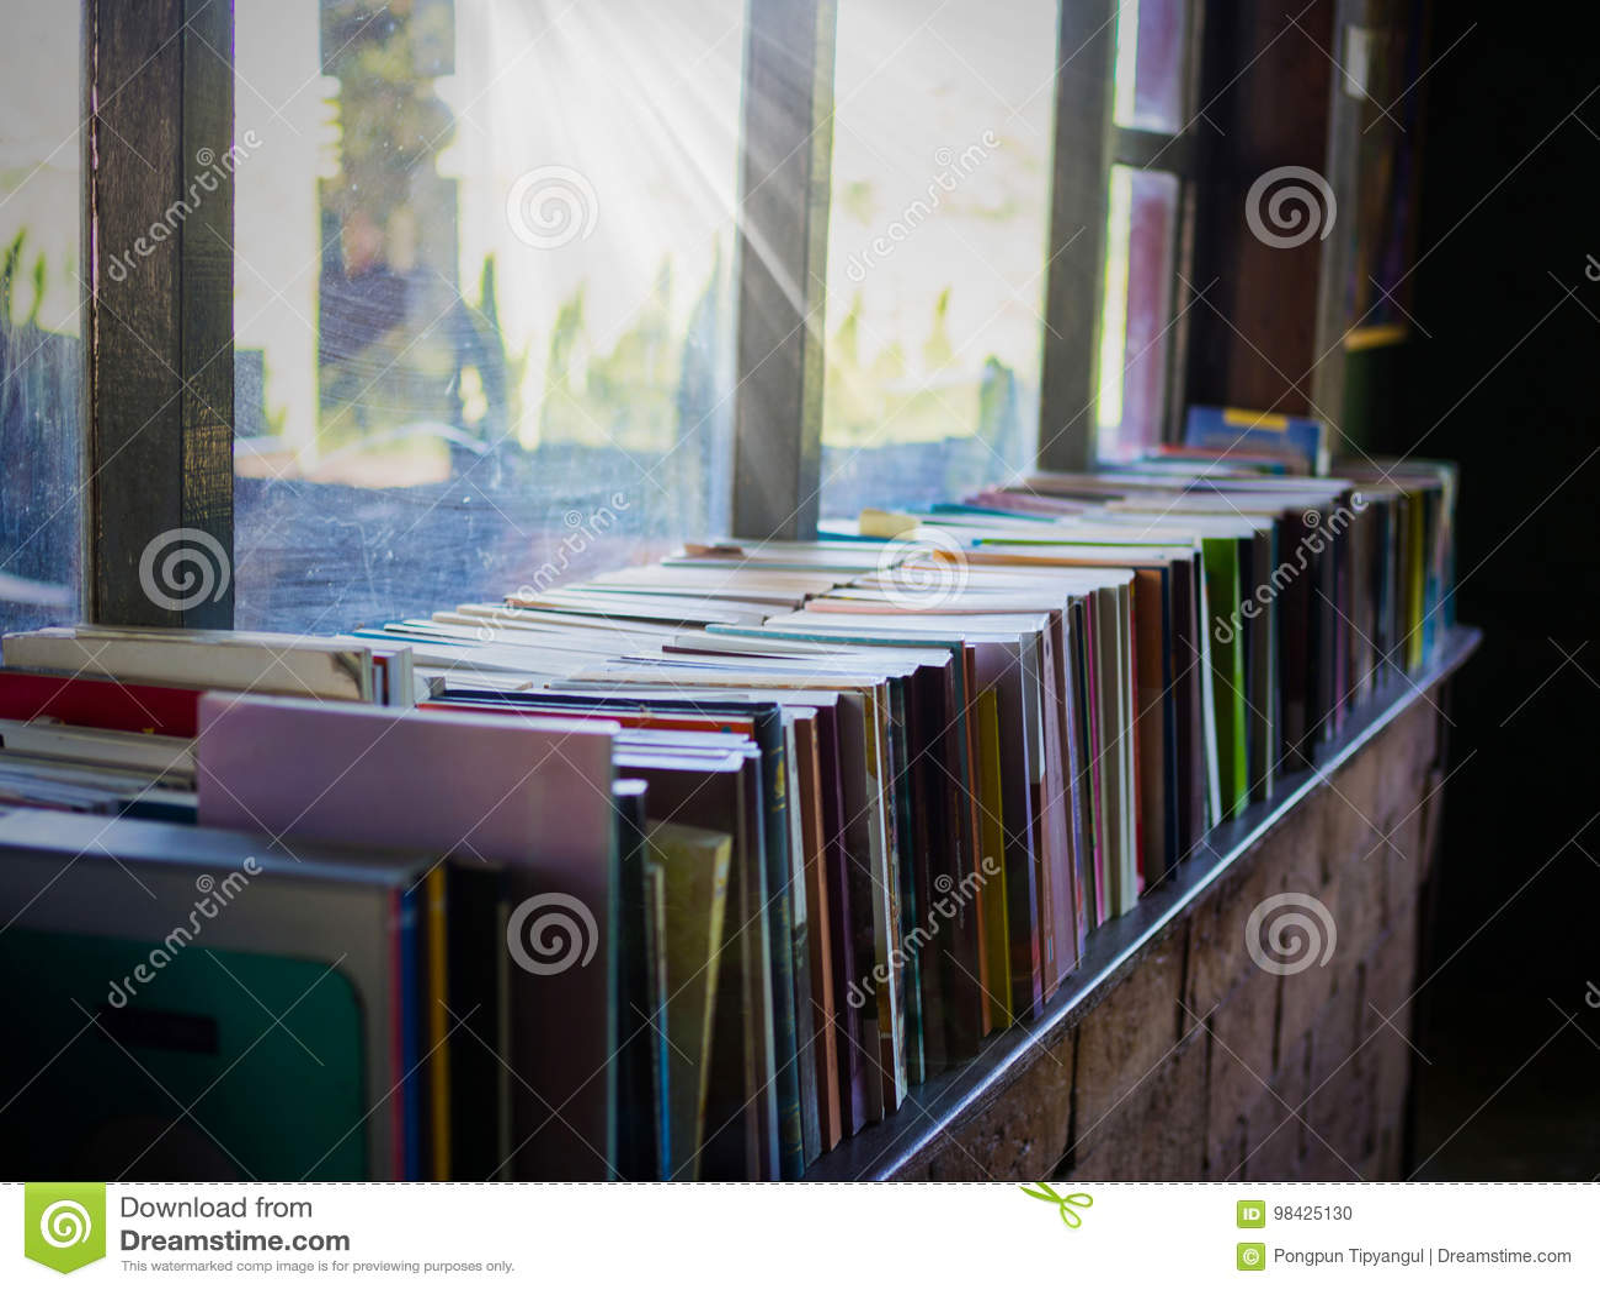 Vintage Books On Bookshelf Download Preview